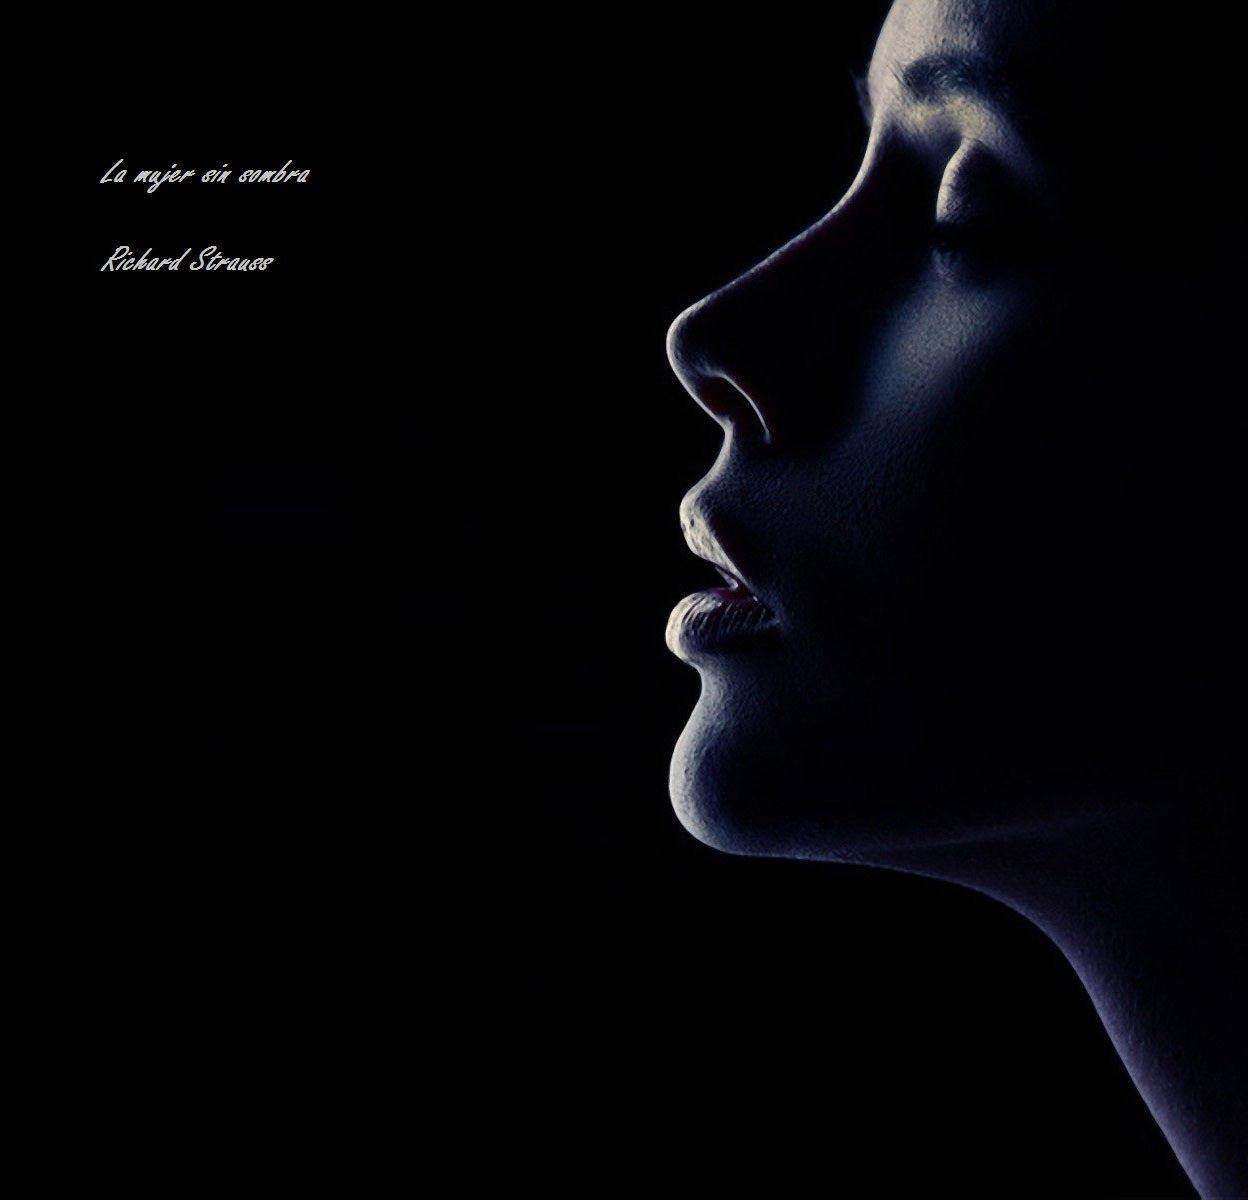 la mujer sin sombra strauss